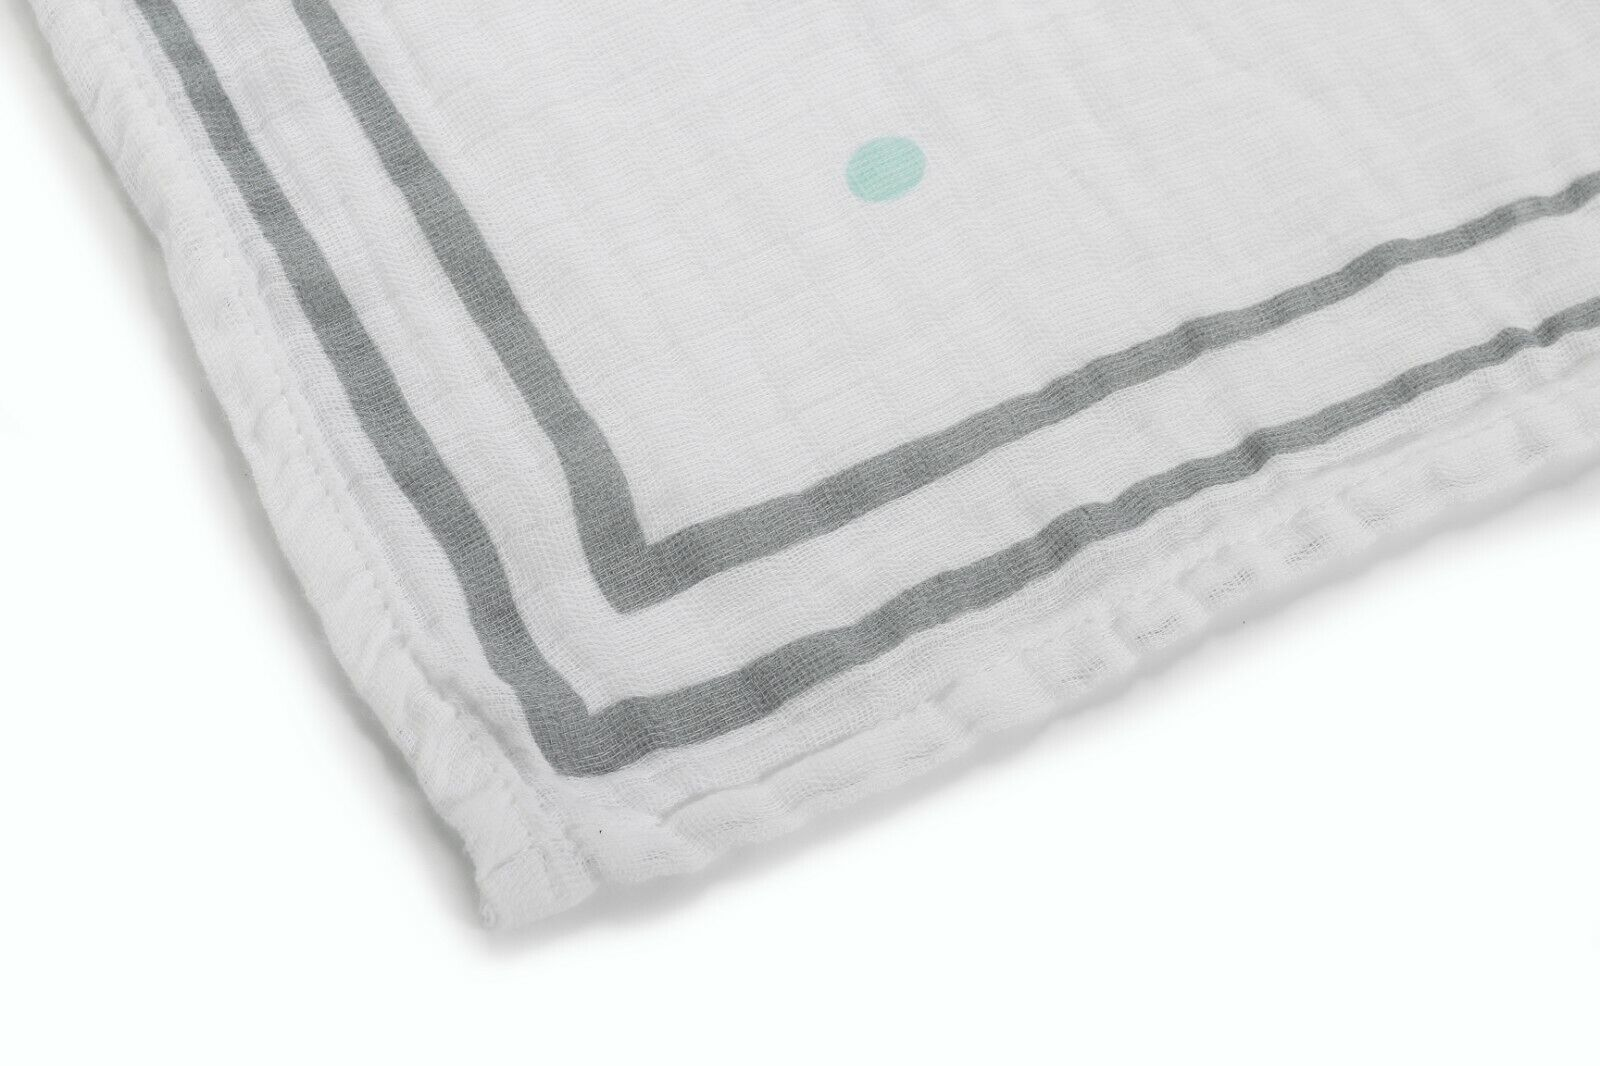 Muslin Blanket,Ultra Cozy Soft Baby Blankets For Newborn,Infant,Toddler White - $6.99